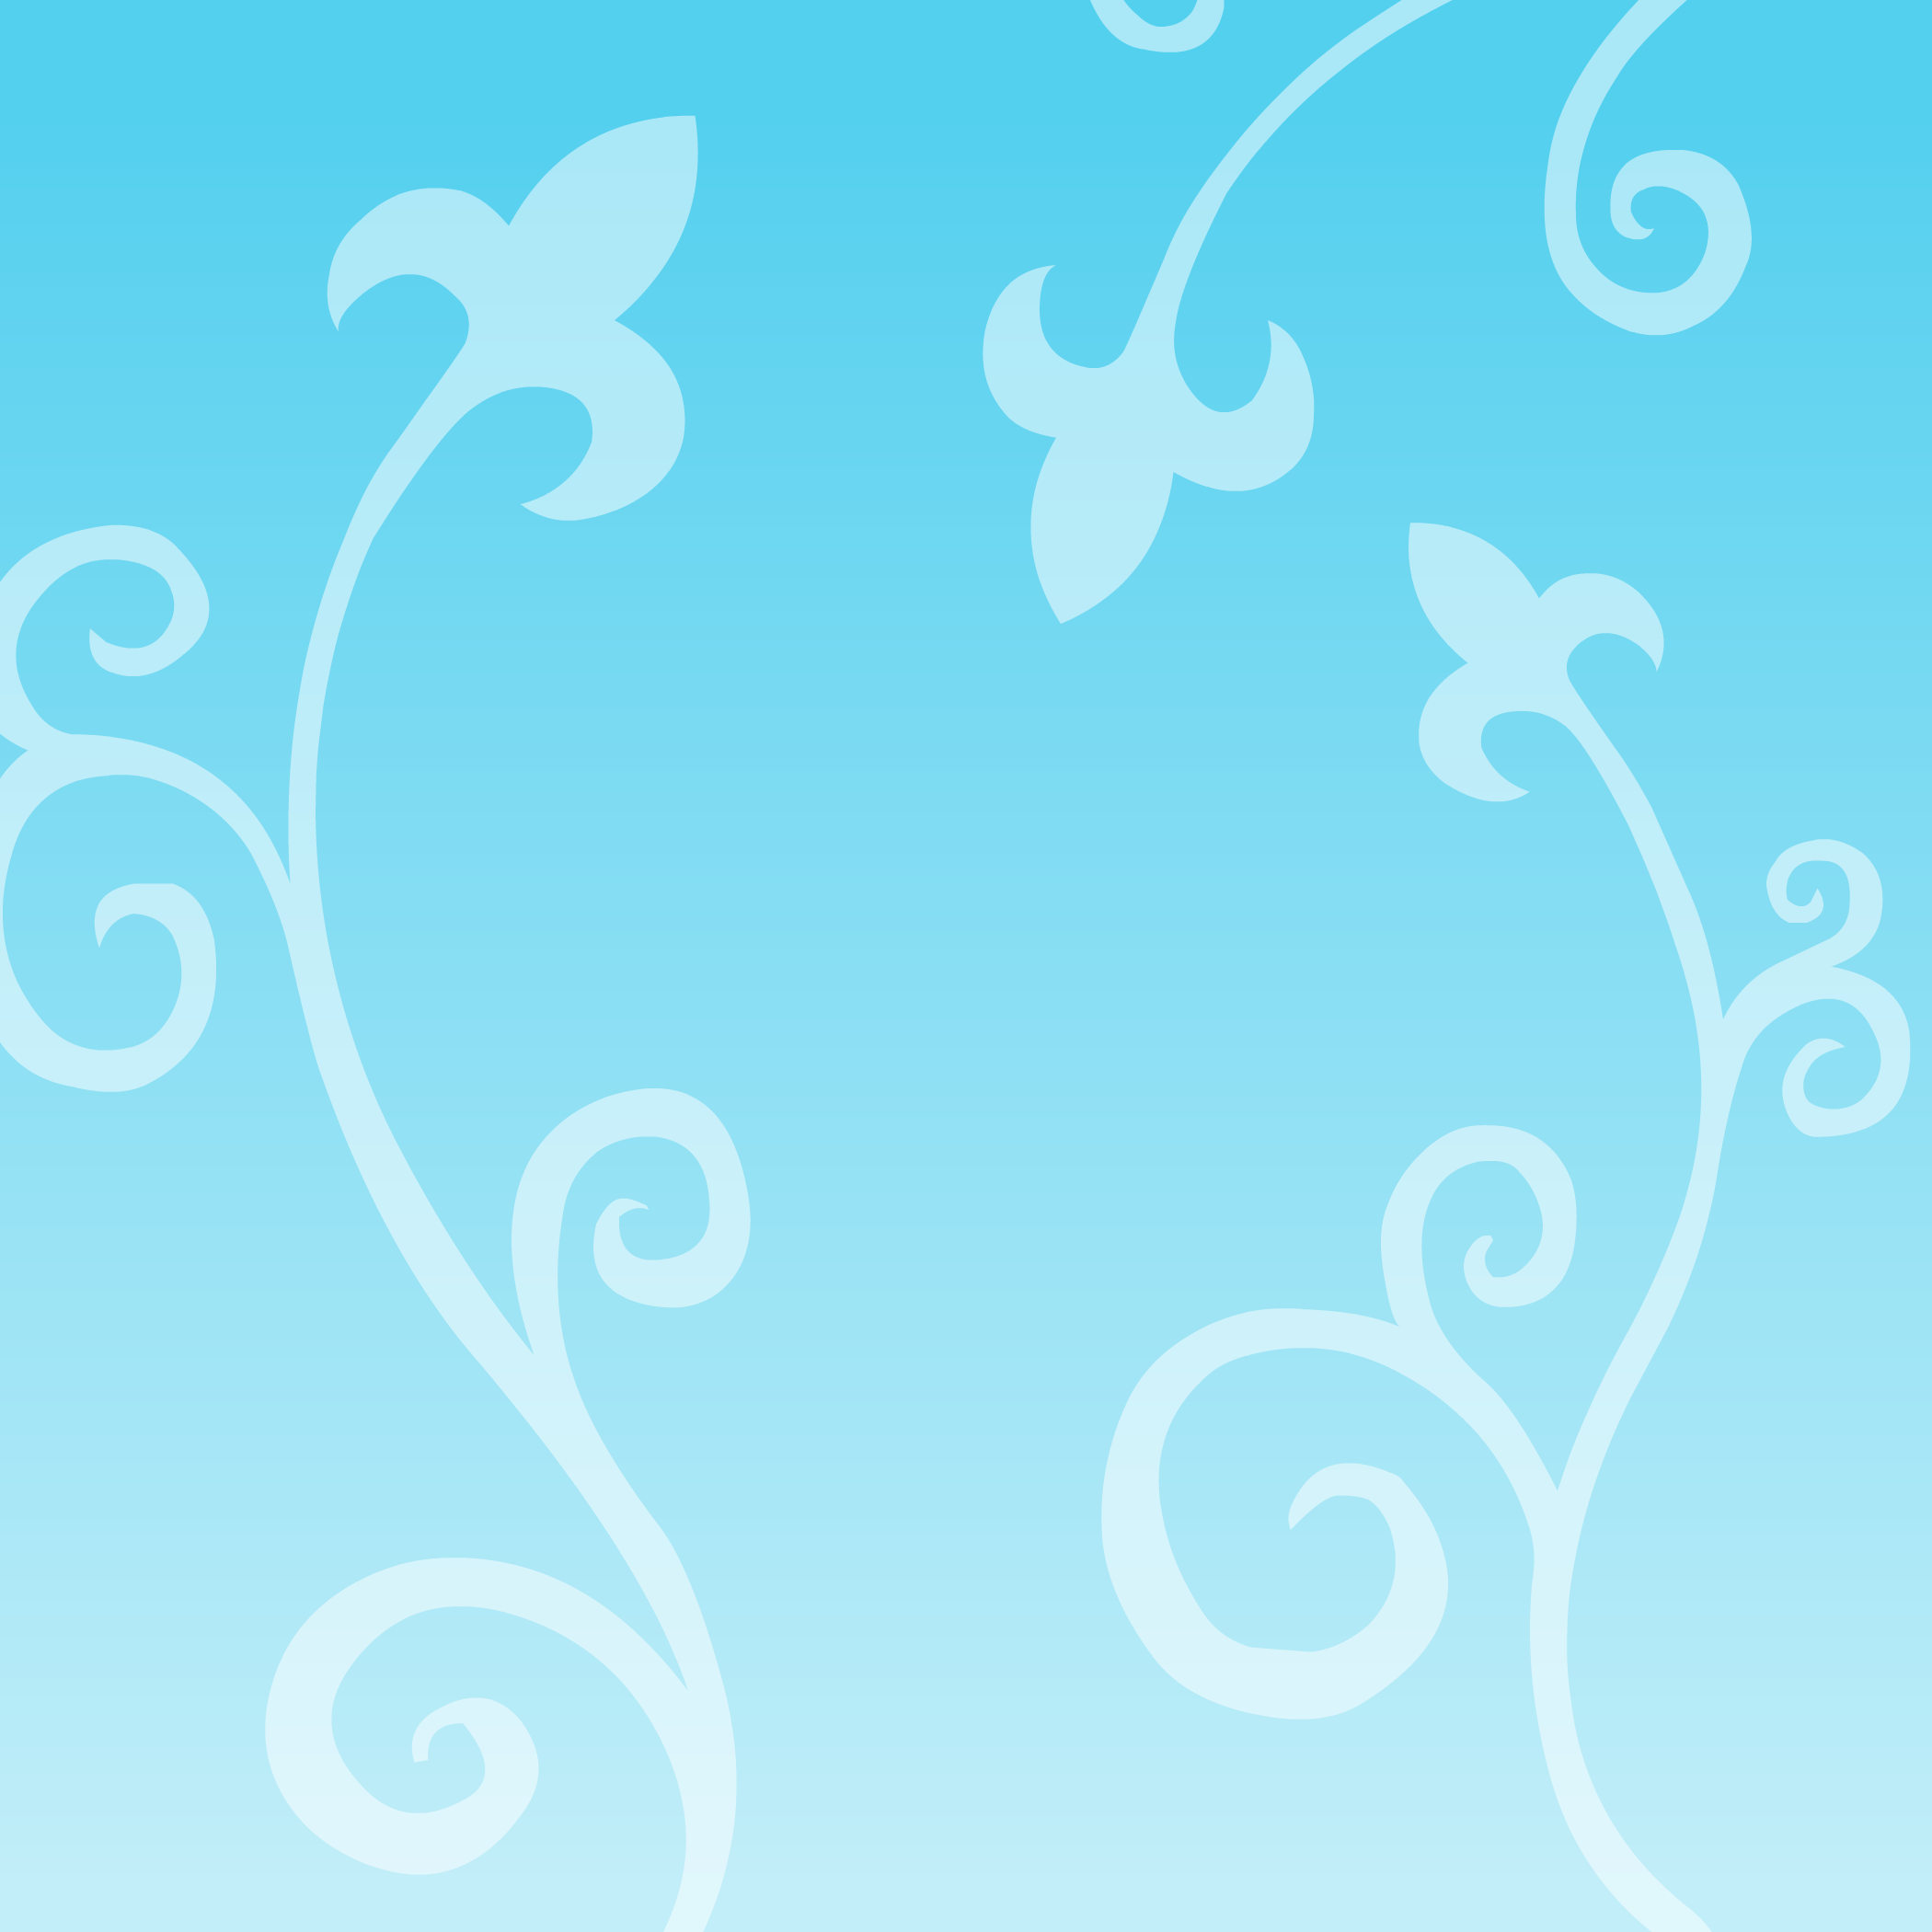 Blue Vines Background